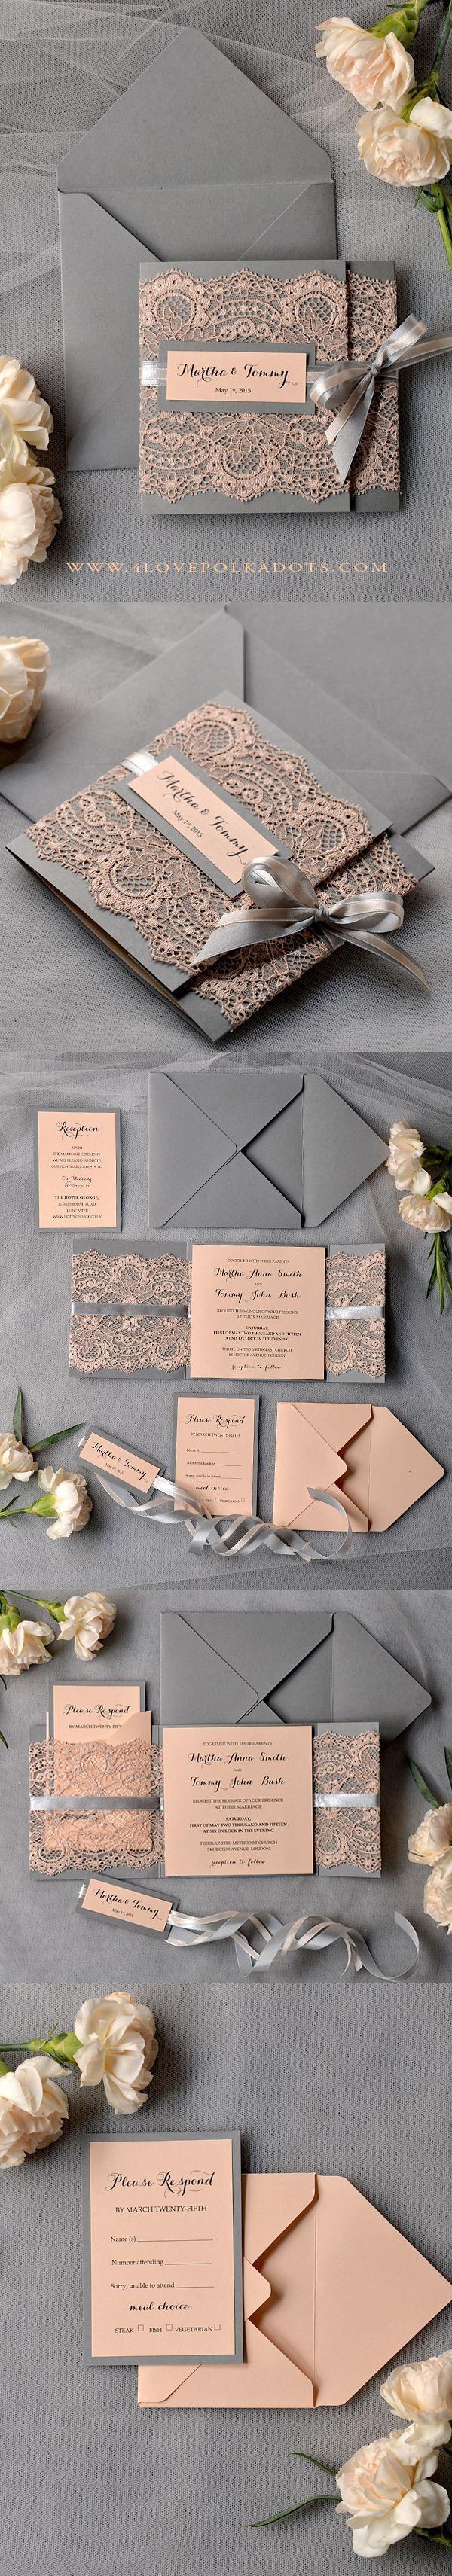 inexpensive wedding invitations with response cards%0A Peach  u     Grey Lace Wedding Invitations  perfectwedding  weddingideas  lace u